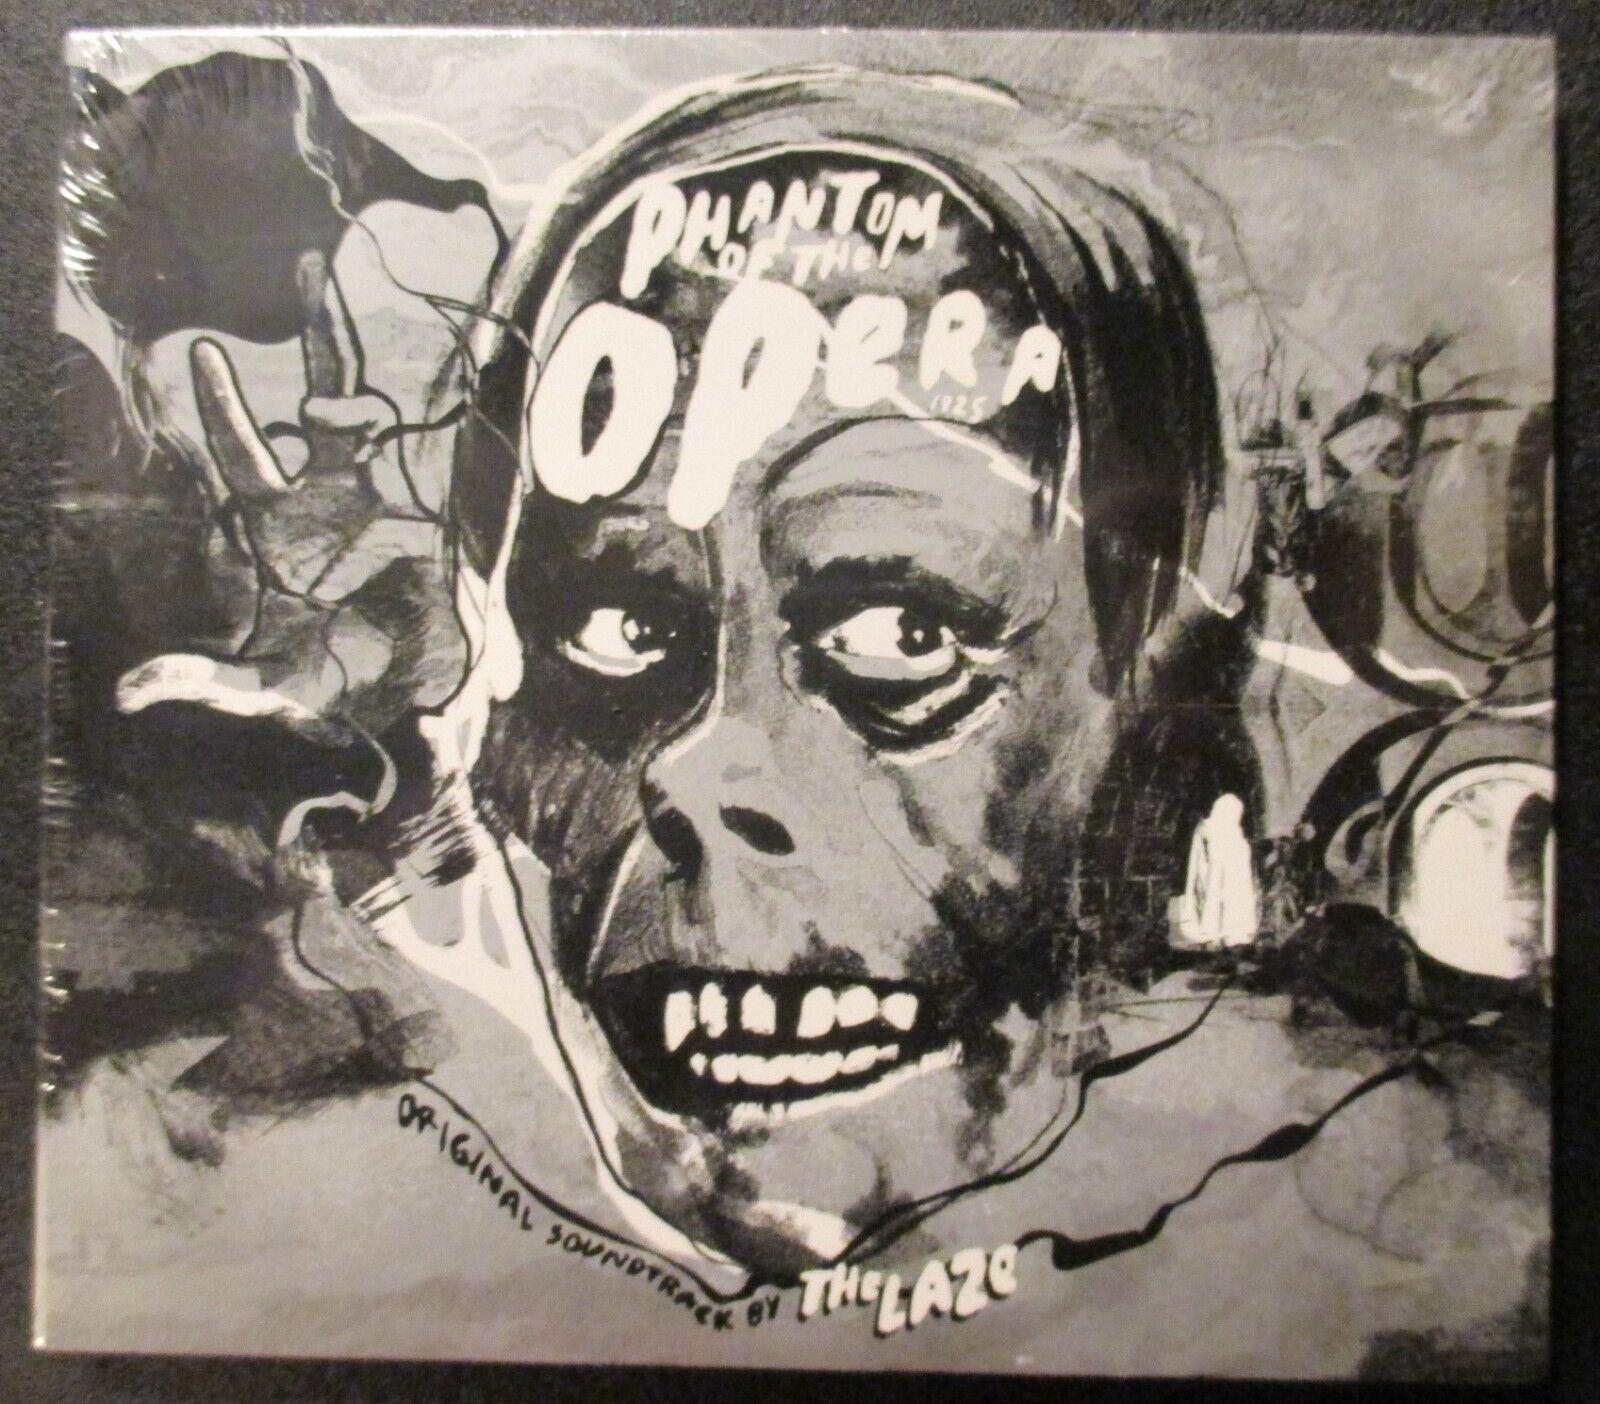 THE PHANTOM OF THE OPERA 1925 - Ltd Ed Original Soundtrack CD Music By THE LAZE - $12.95